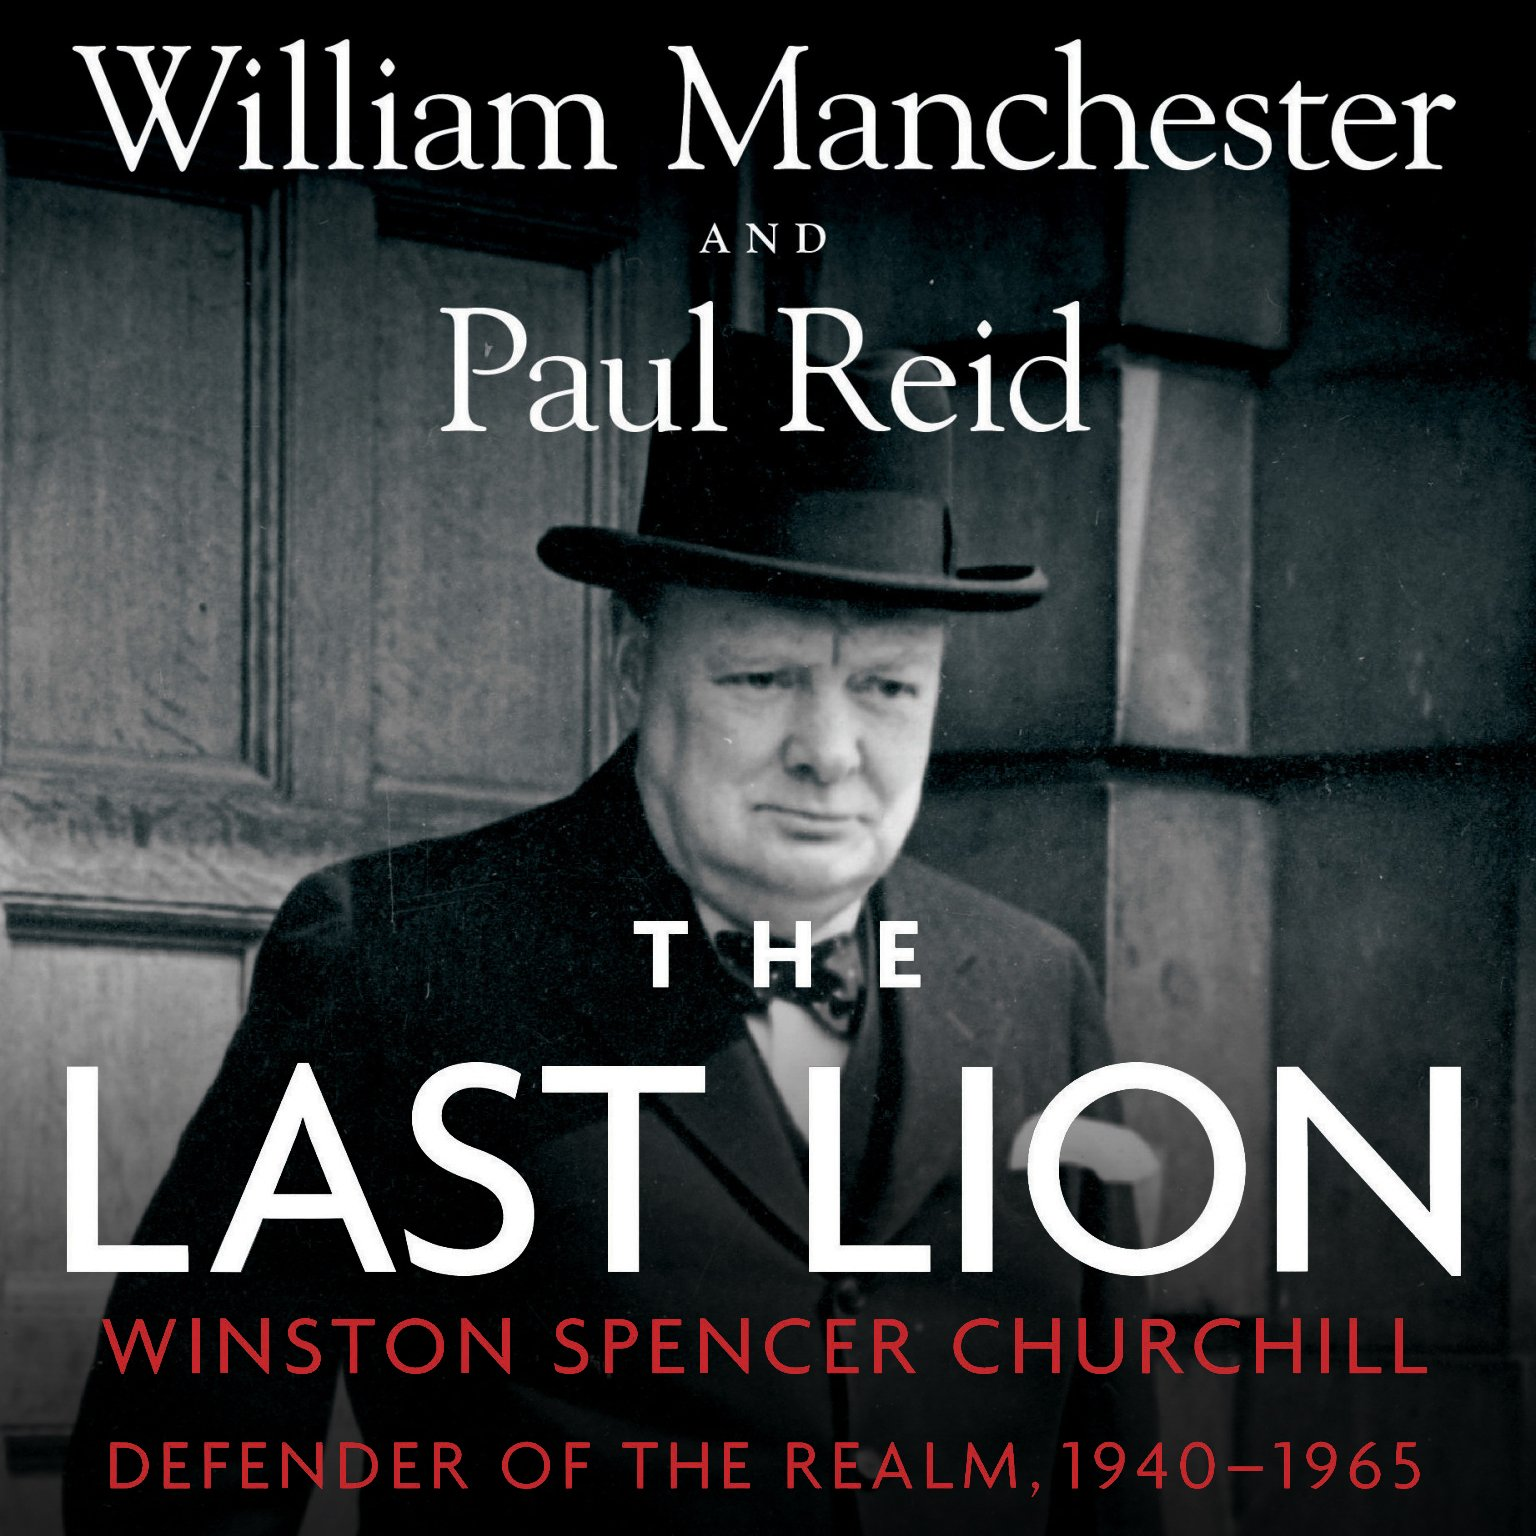 The Last Lion: Winston Spencer Churchill, Volume 3: Defender of the Realm, 1940-1965